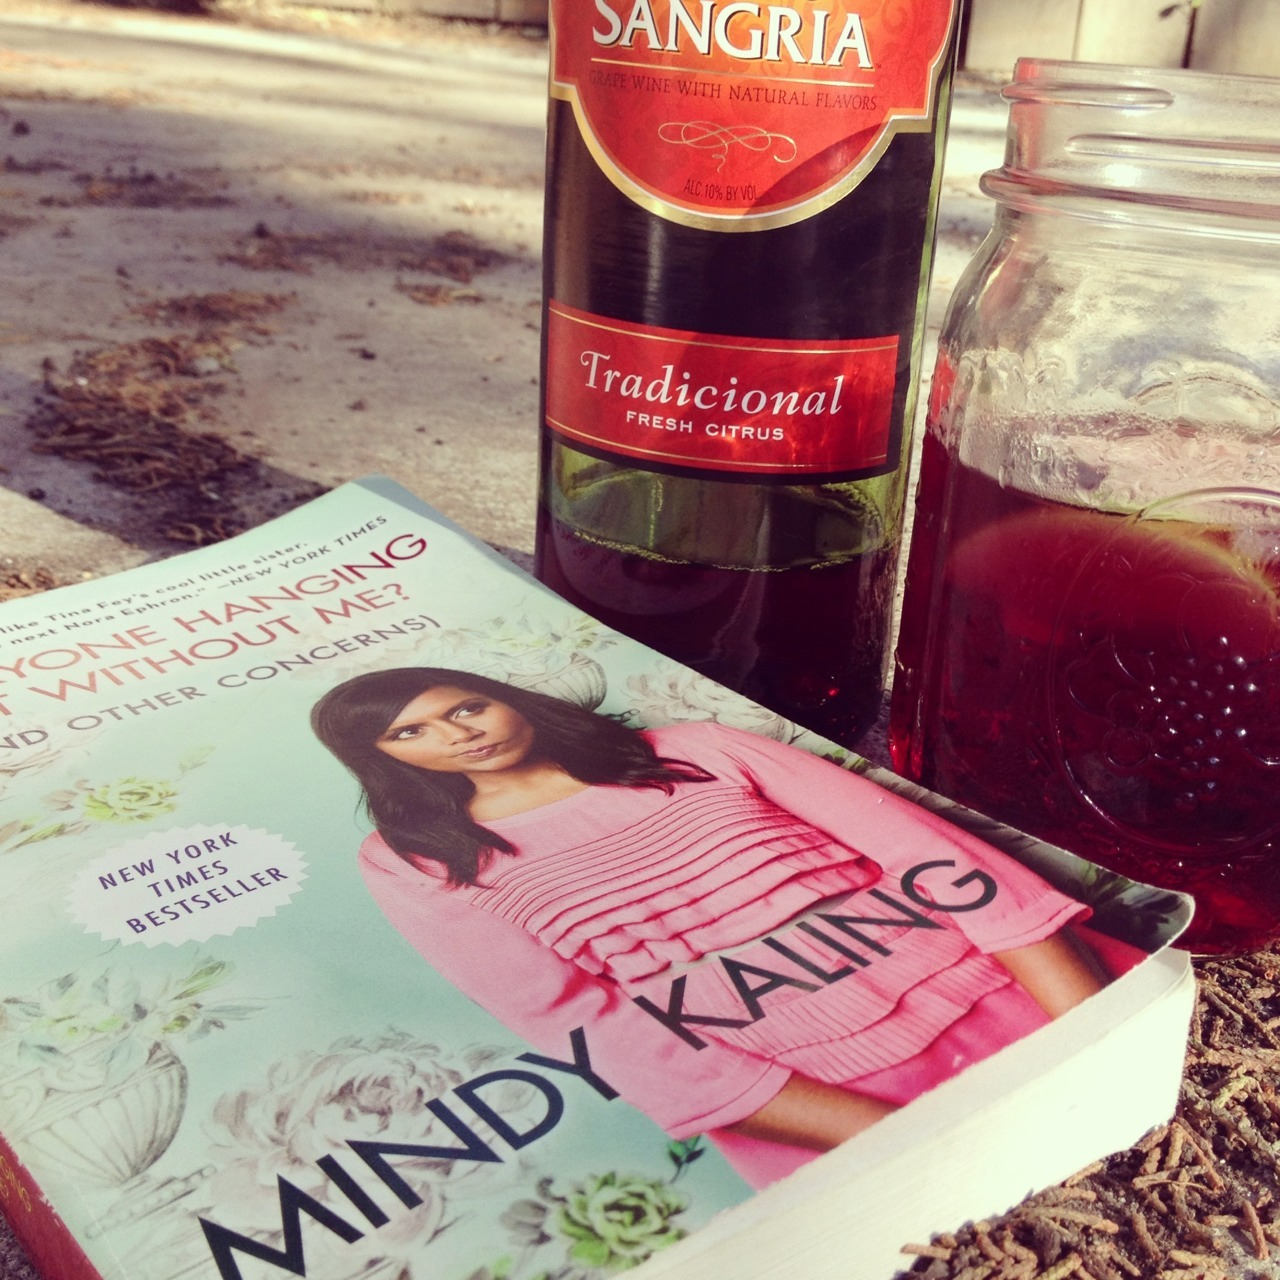 wine and books!